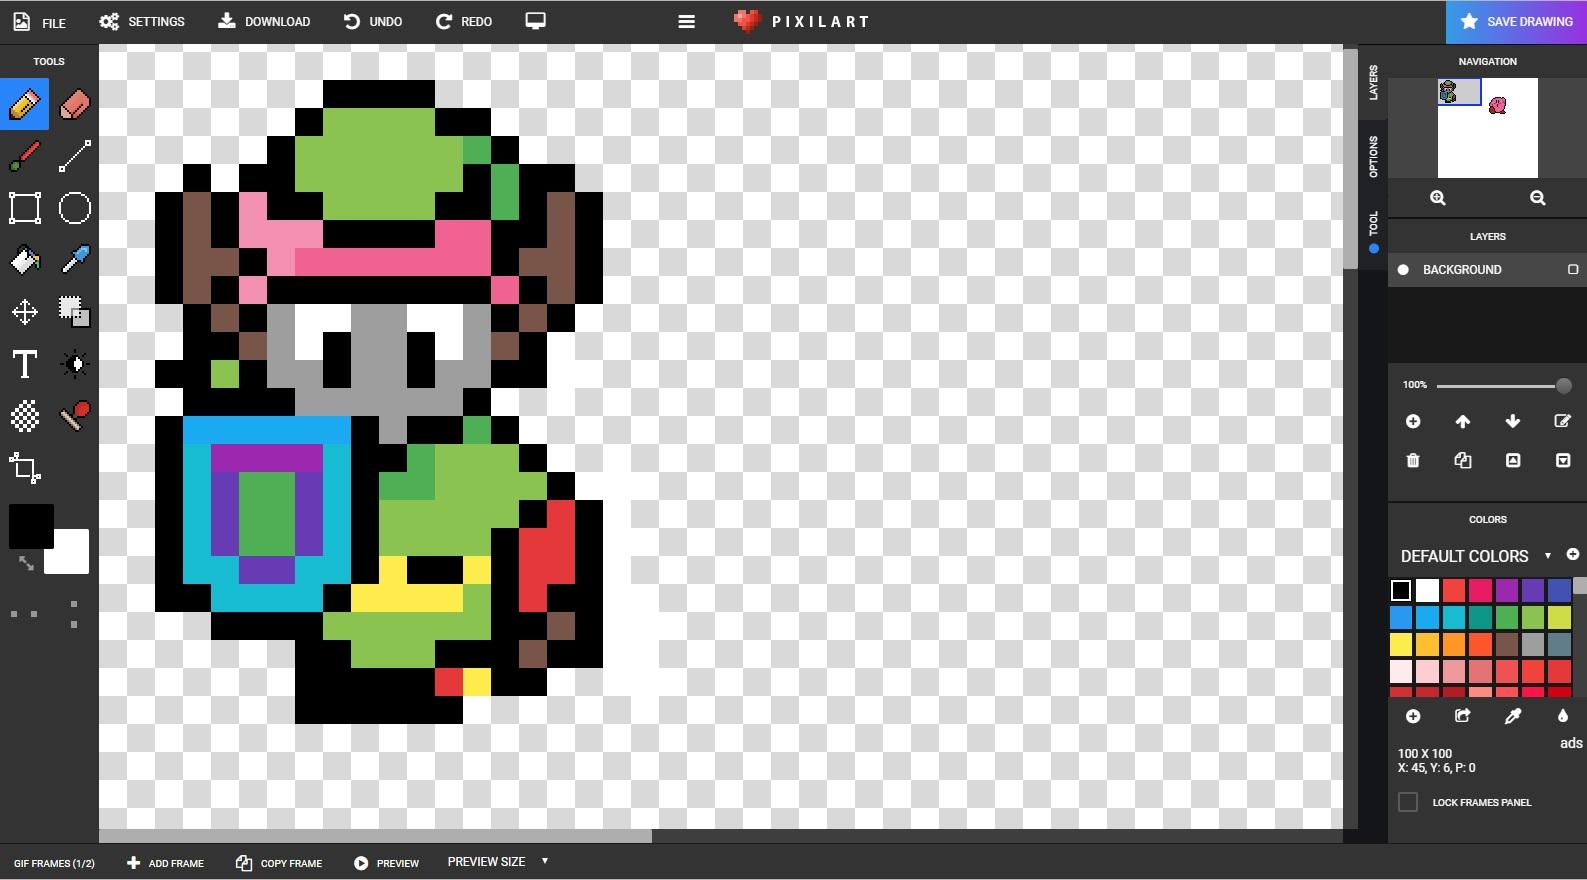 PixelArtScreen.jpg